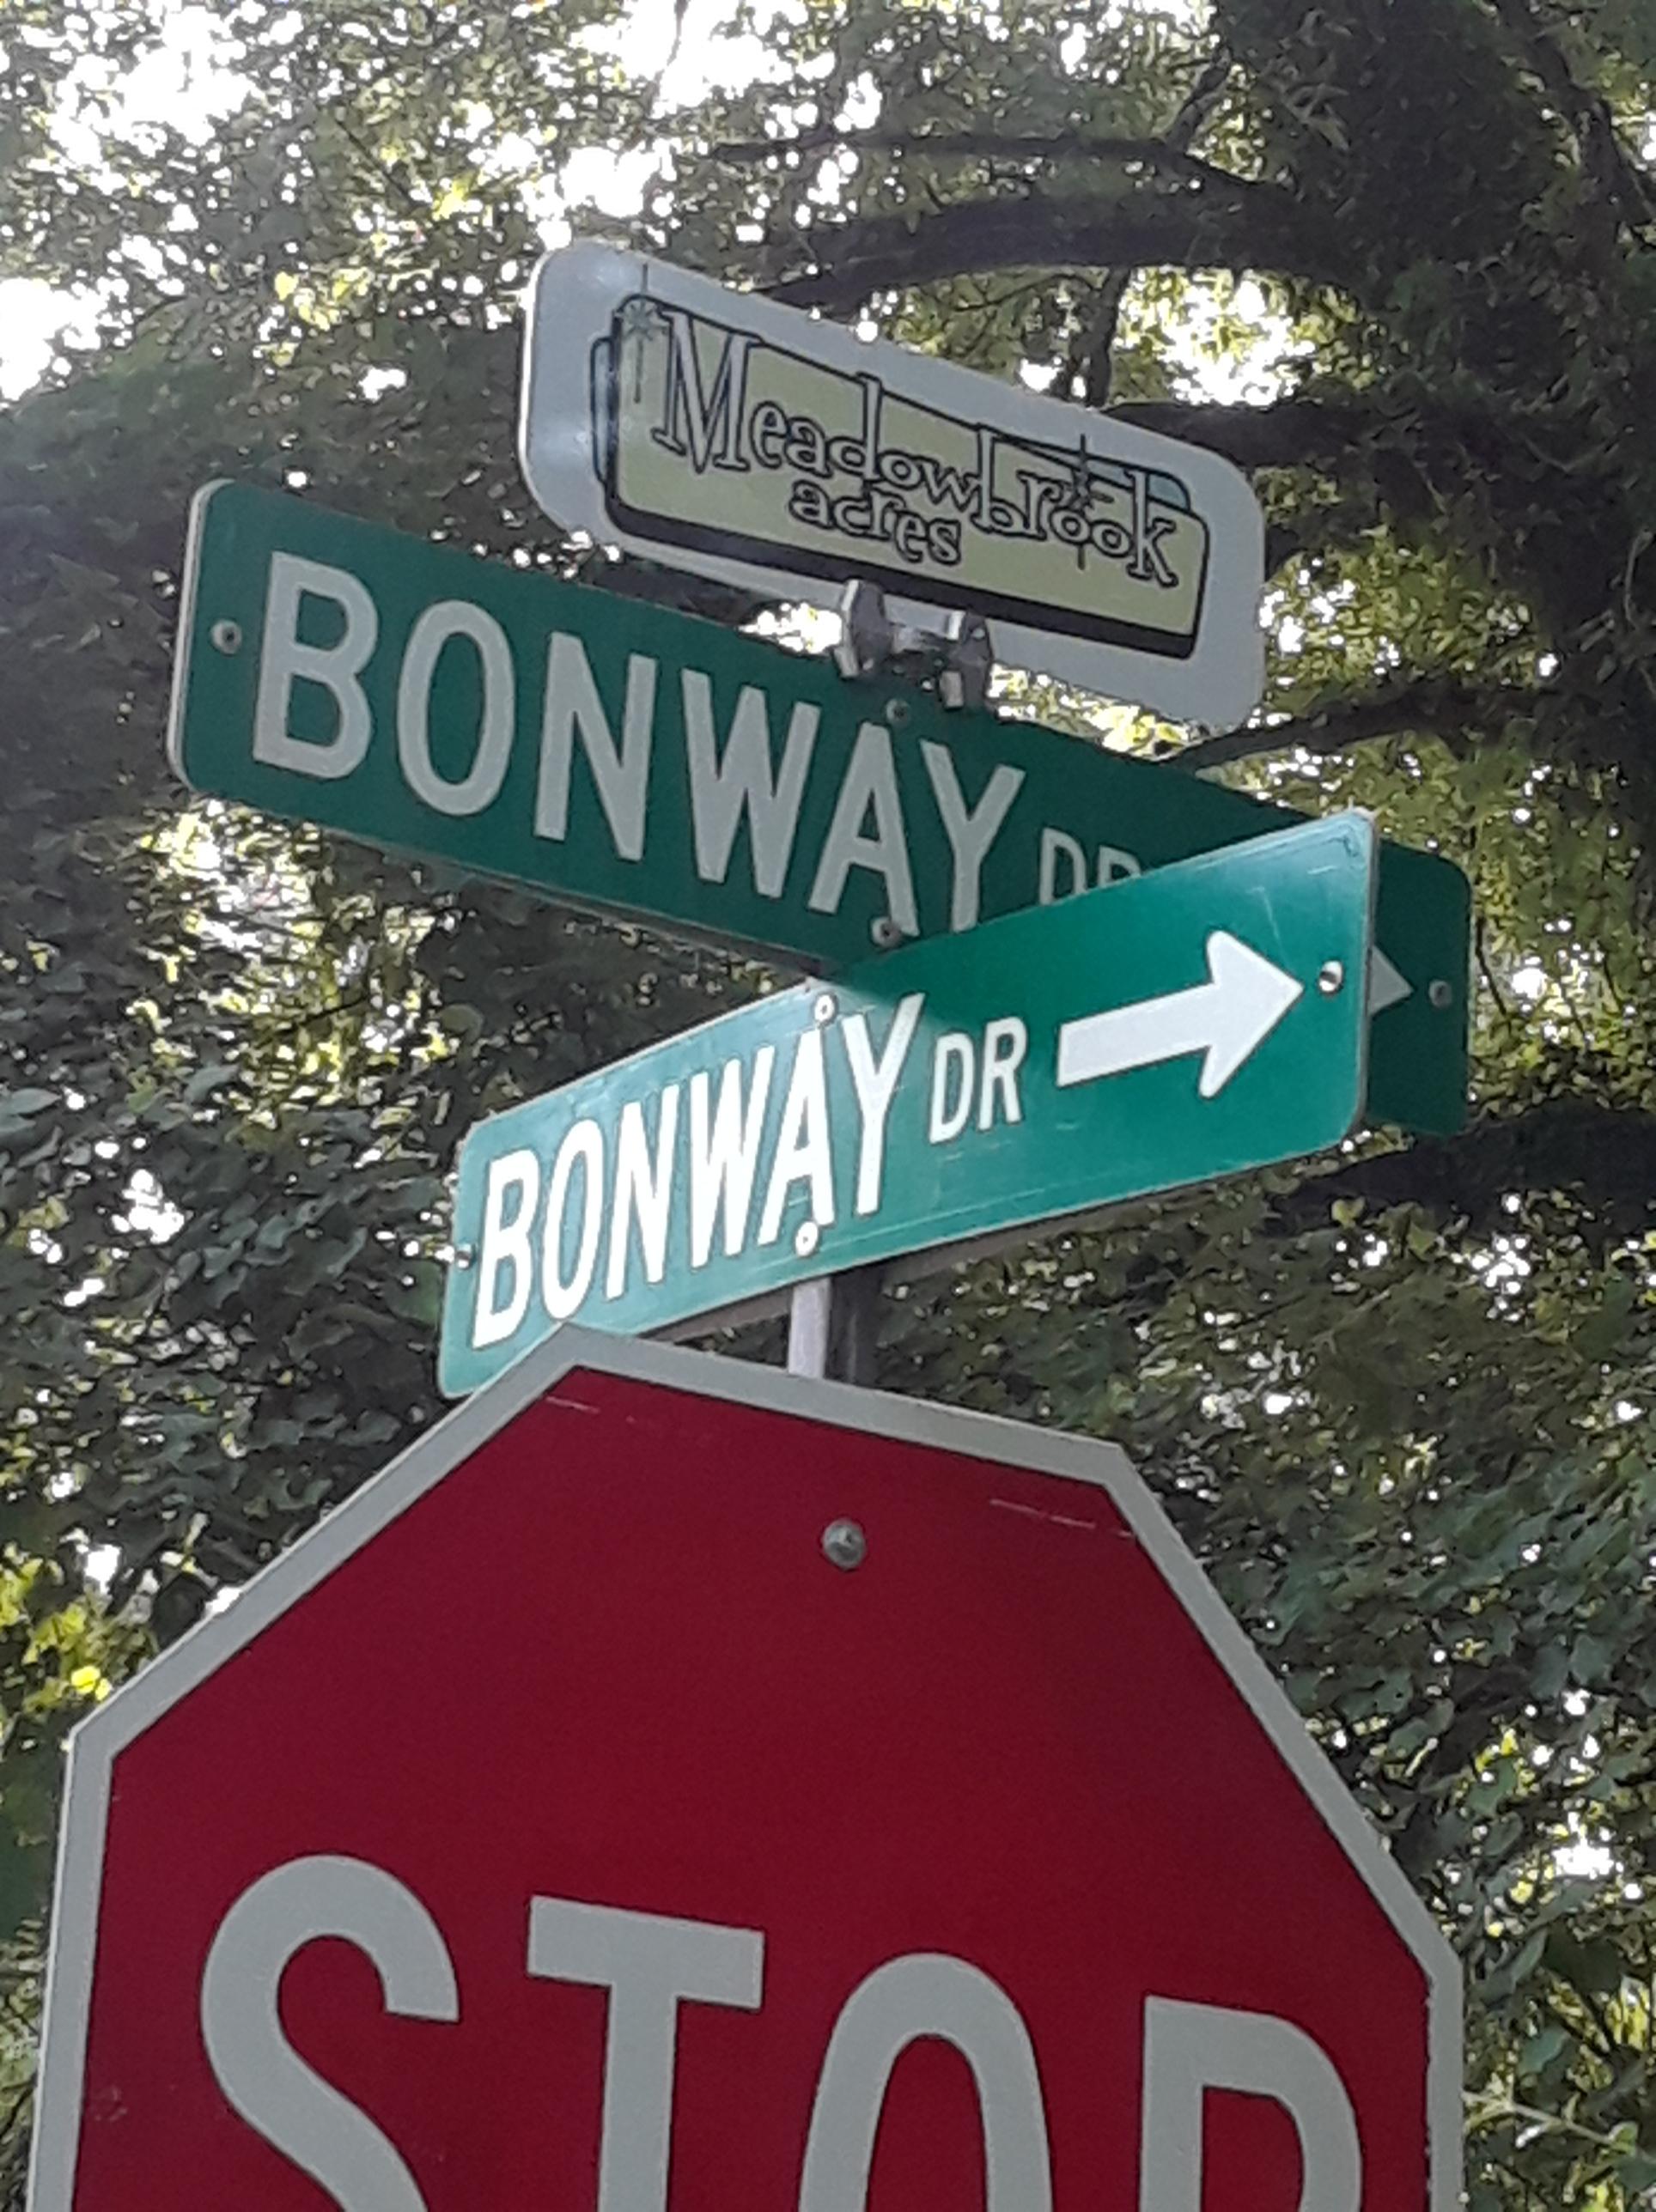 Decatur Neighborhood Meadowbrook Acres Street Sign Toppers Mid Century design